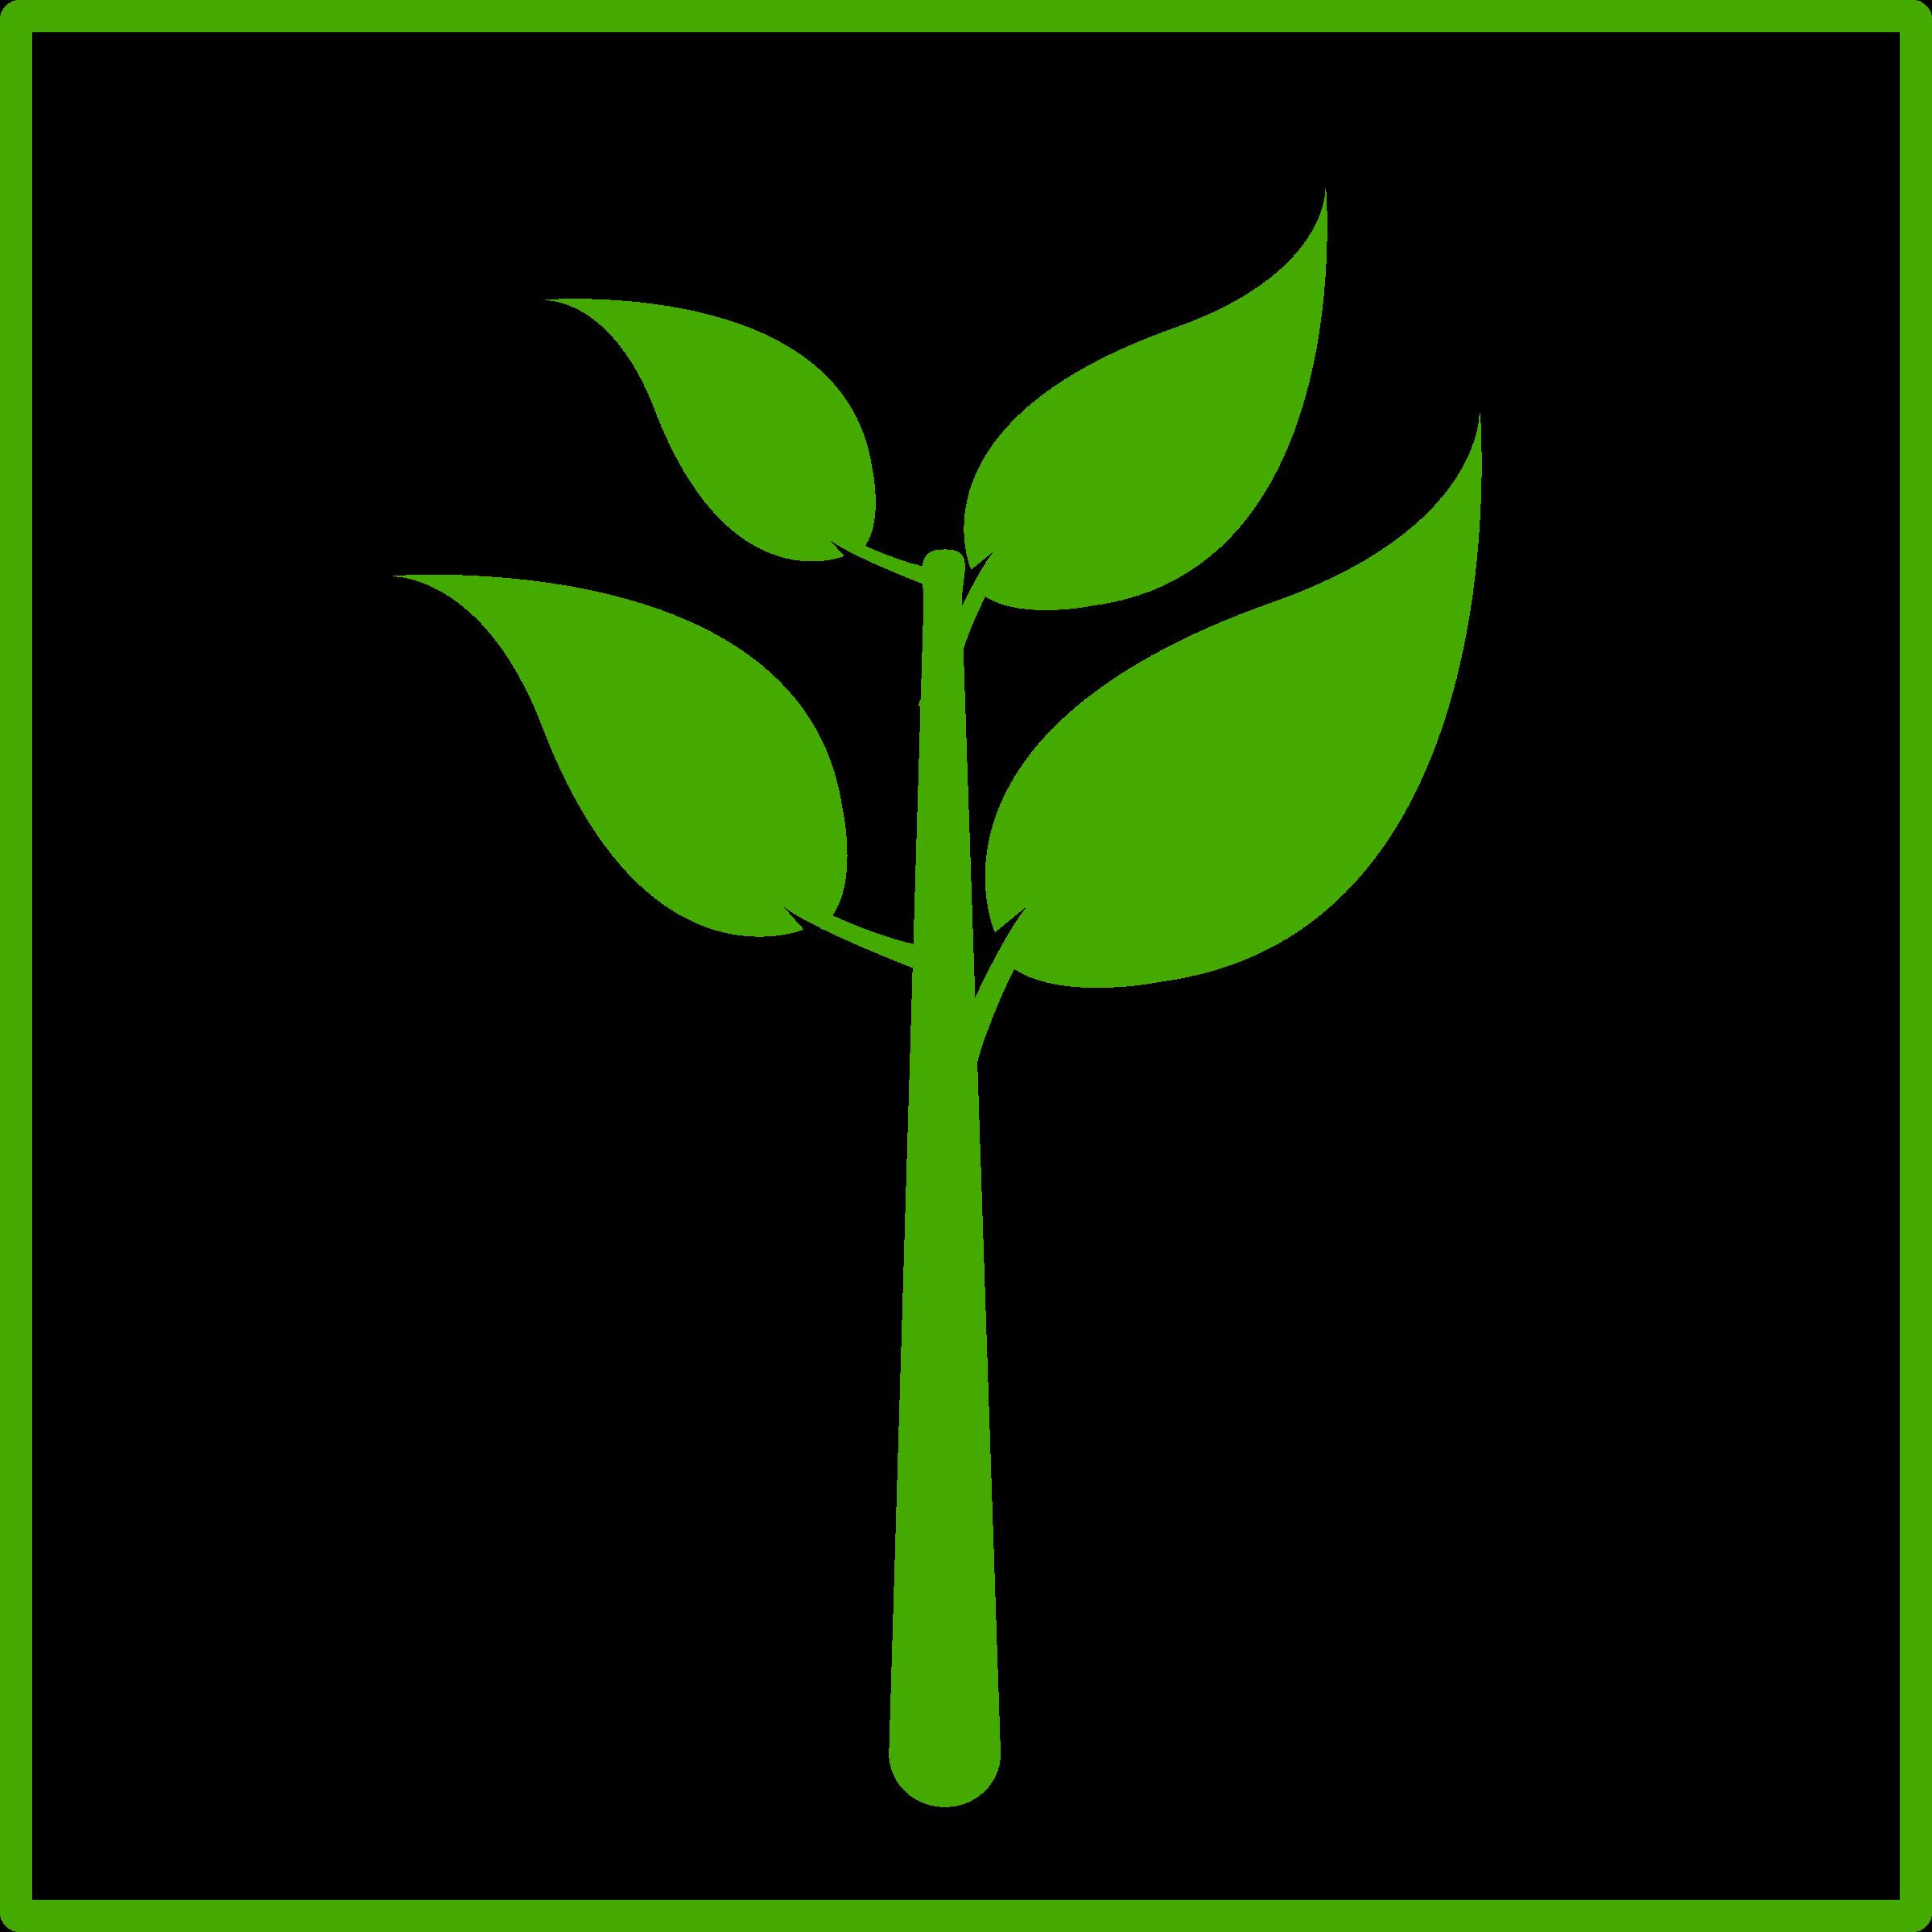 Eco green plant icon. Seedling clipart leaf stem